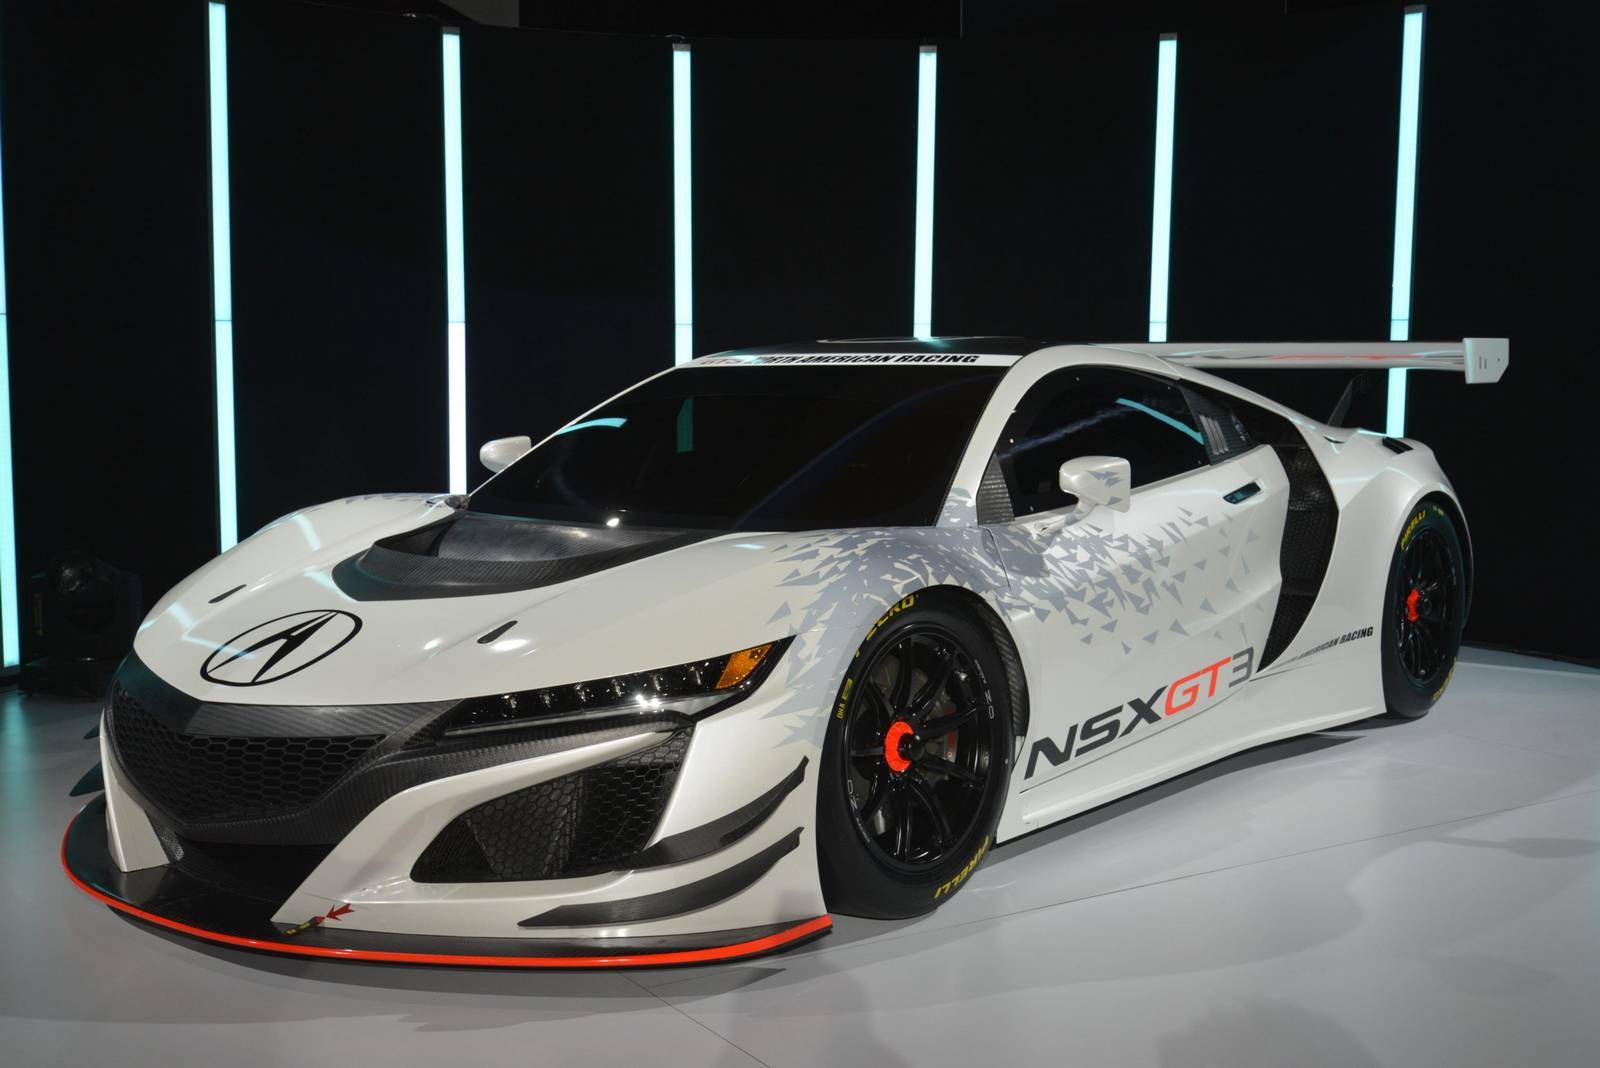 New York 2016: Acura NSX GT3 - GTspirit